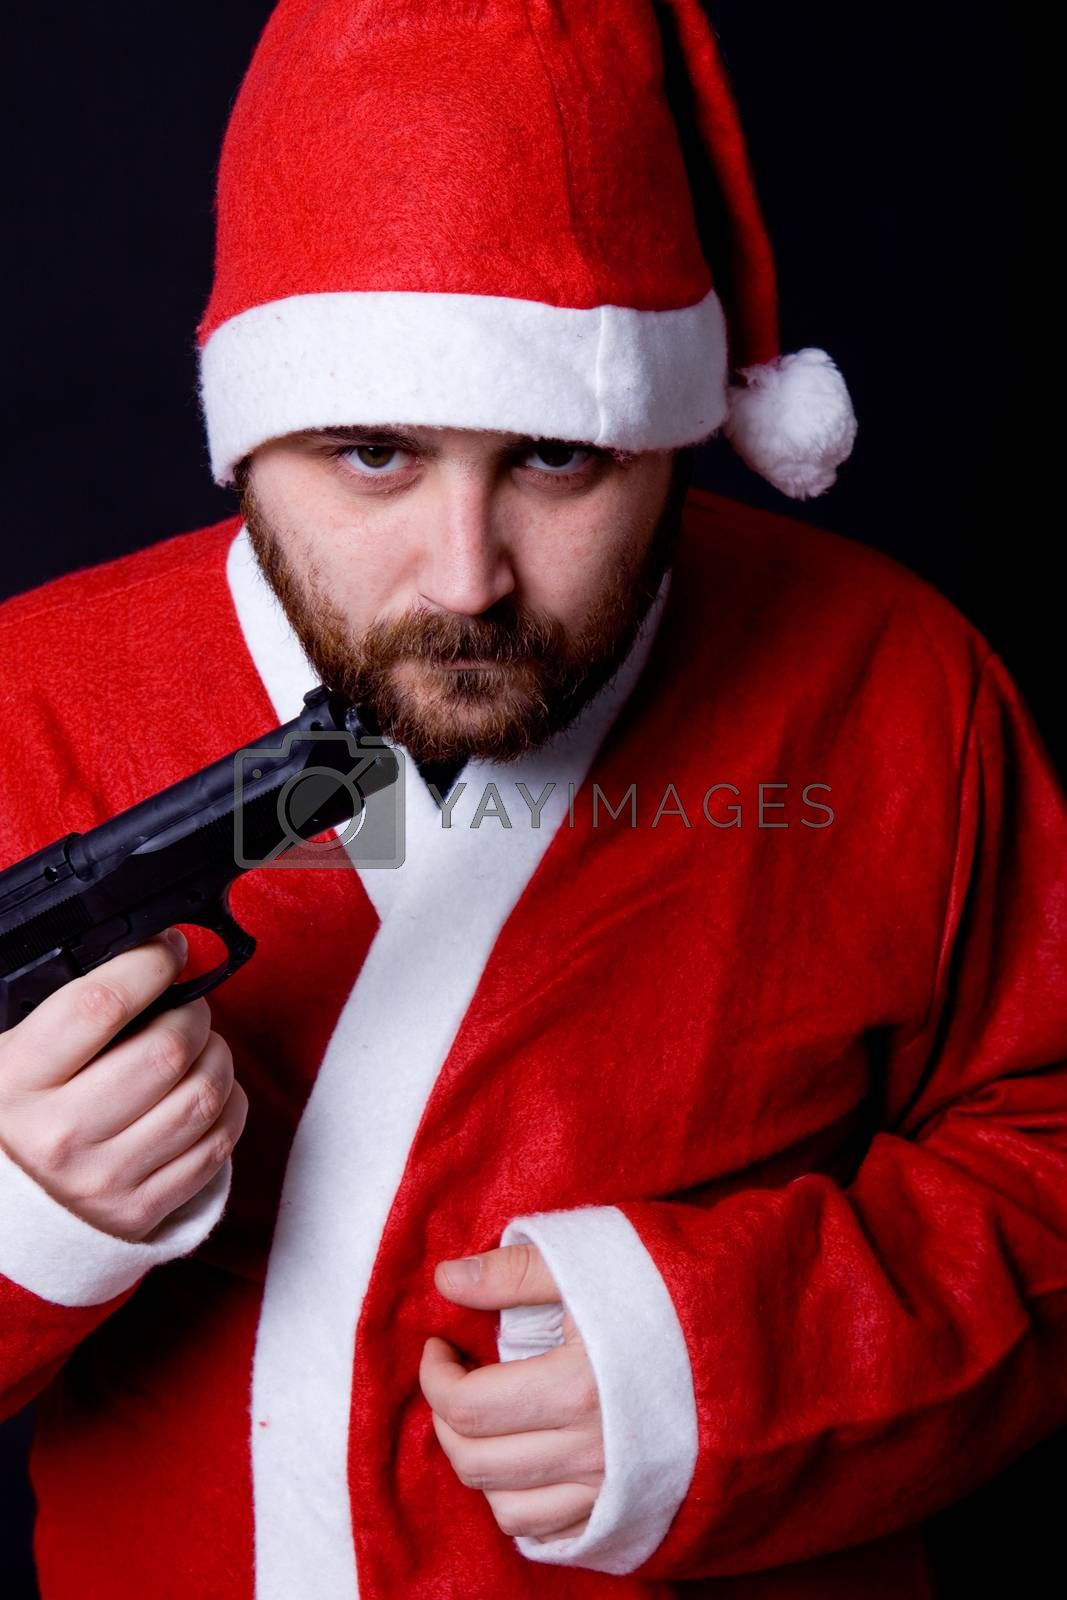 Royalty free image of bad santa by zittto